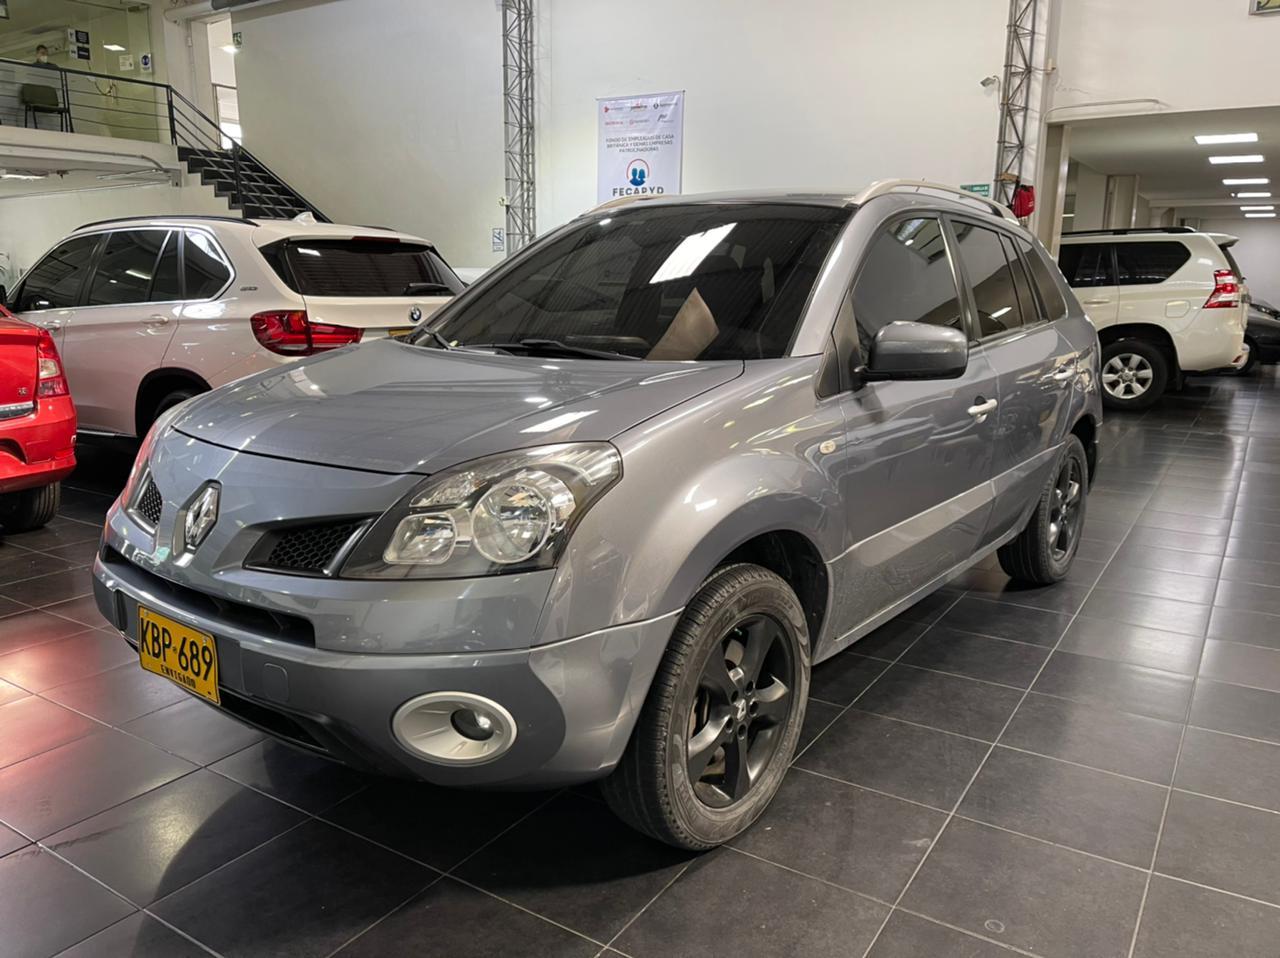 Renault-Koleos-01483620-1